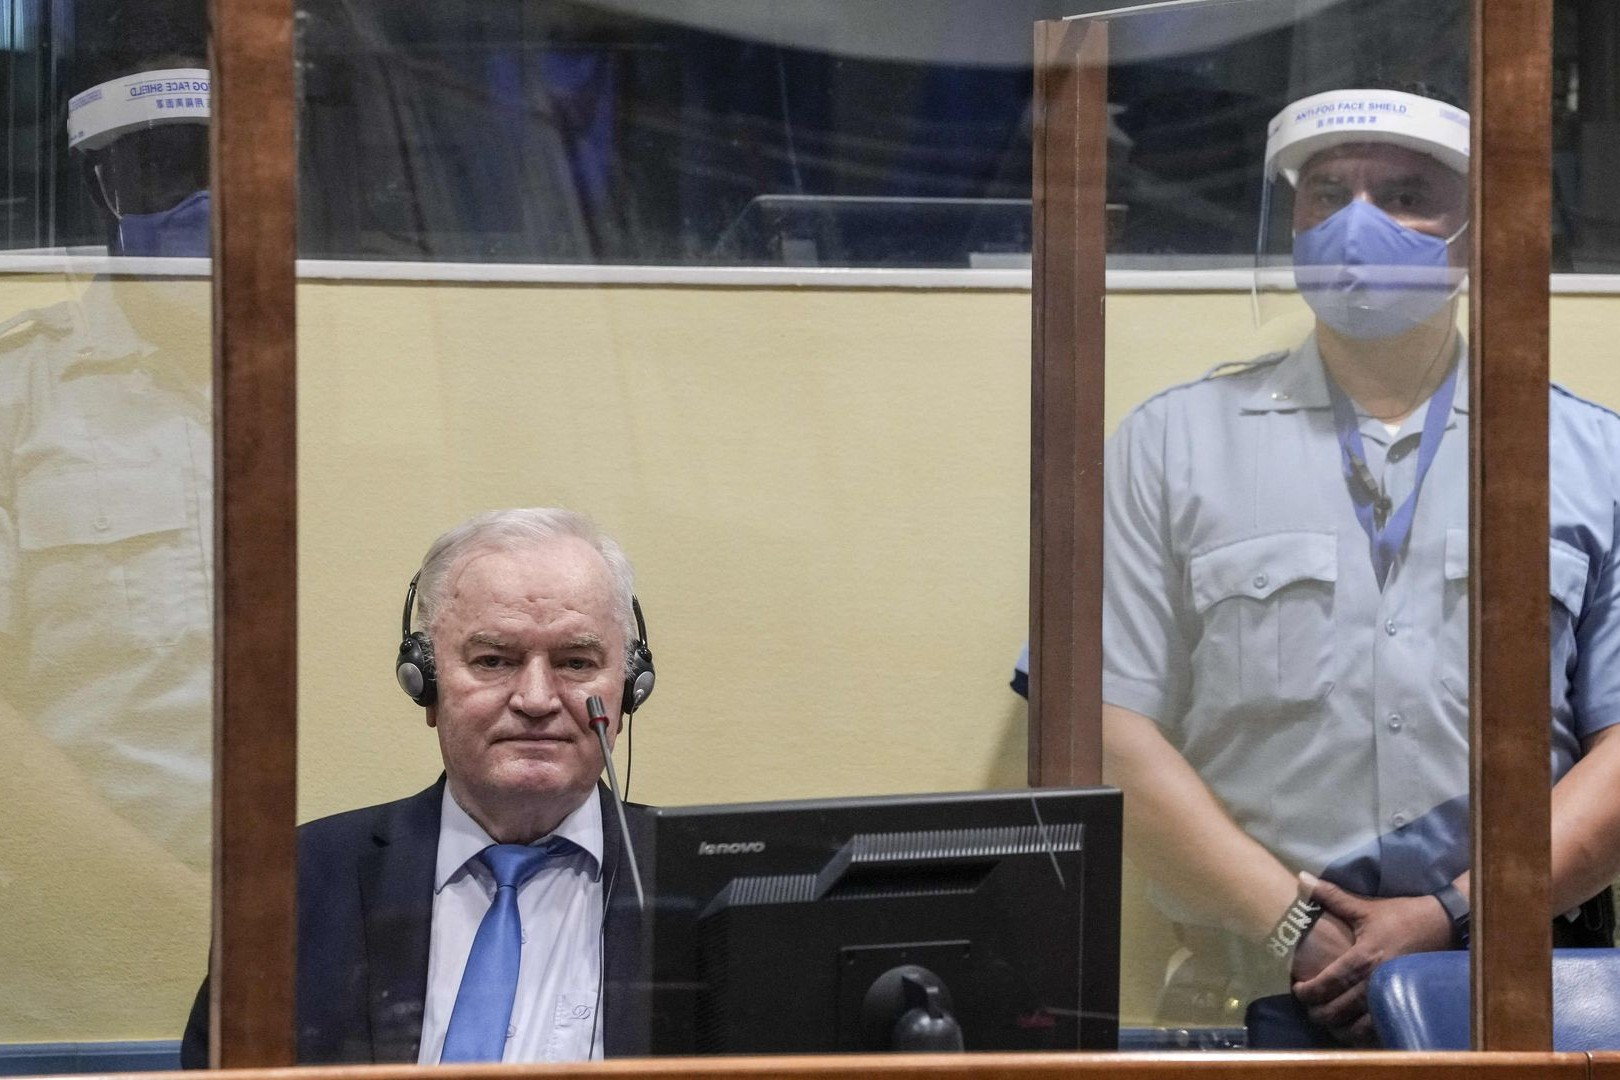 General Ratko Mladić u sudnici tokom izricanja konačne presude, Hag, 08. jun 2021. (Foto: Peter Dejong/Pool/AFP via Getty Images)